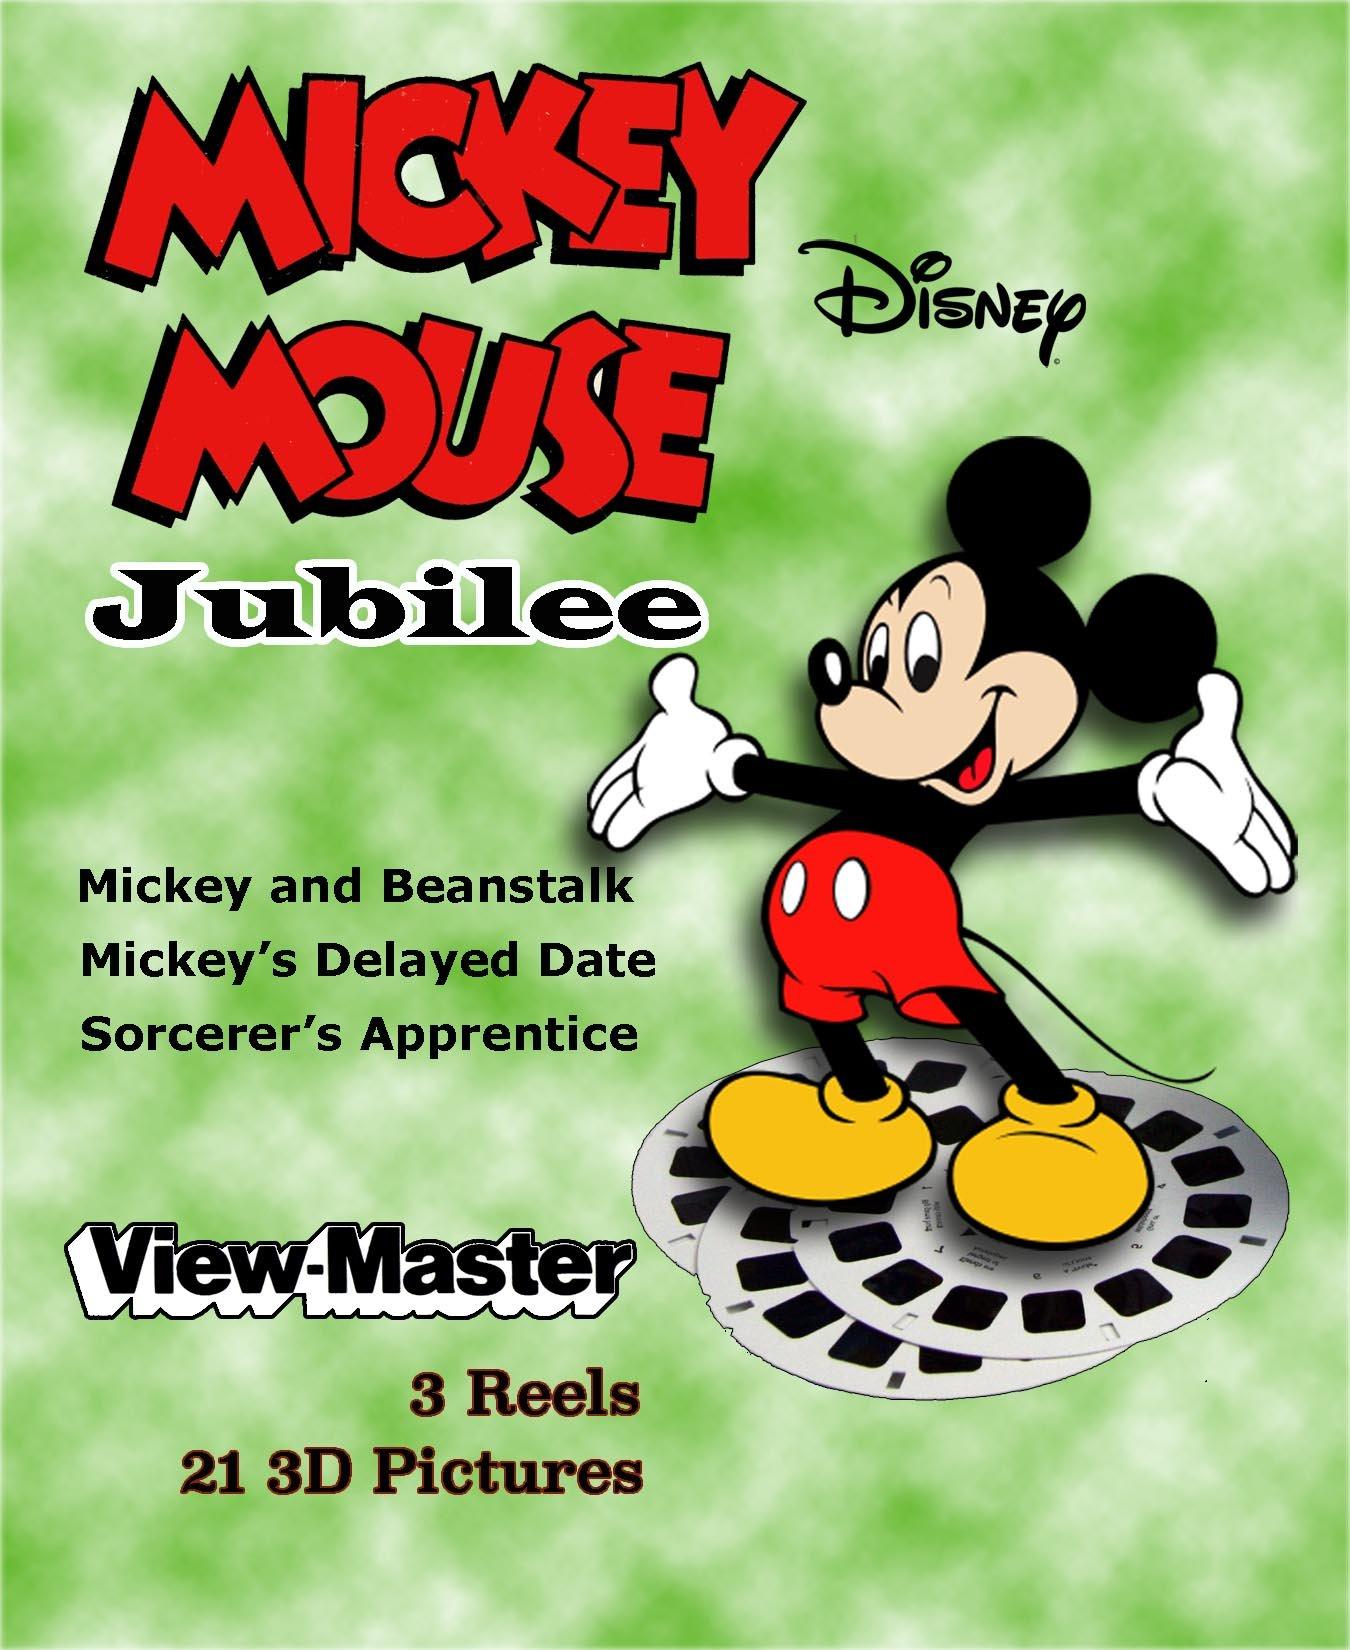 ViewMaster Disney's MICKEY MOUSE JUBILEE - 3 Reels - 3 Stories